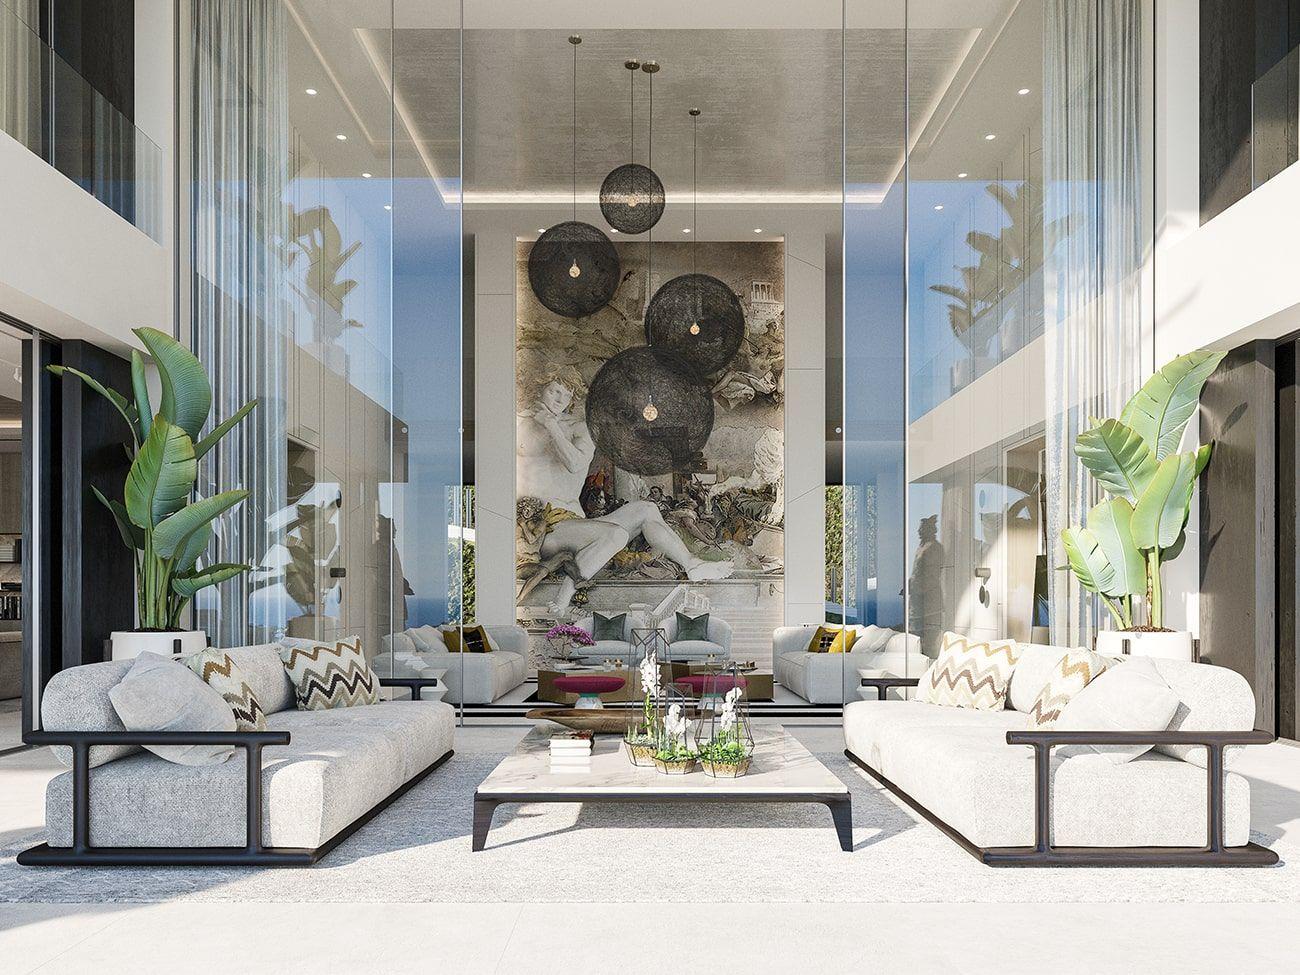 Unraveling A Luxury Living Room In A 15 Million Mansion In Capri Living Room Design Decor Luxury Living Room Home Room Design